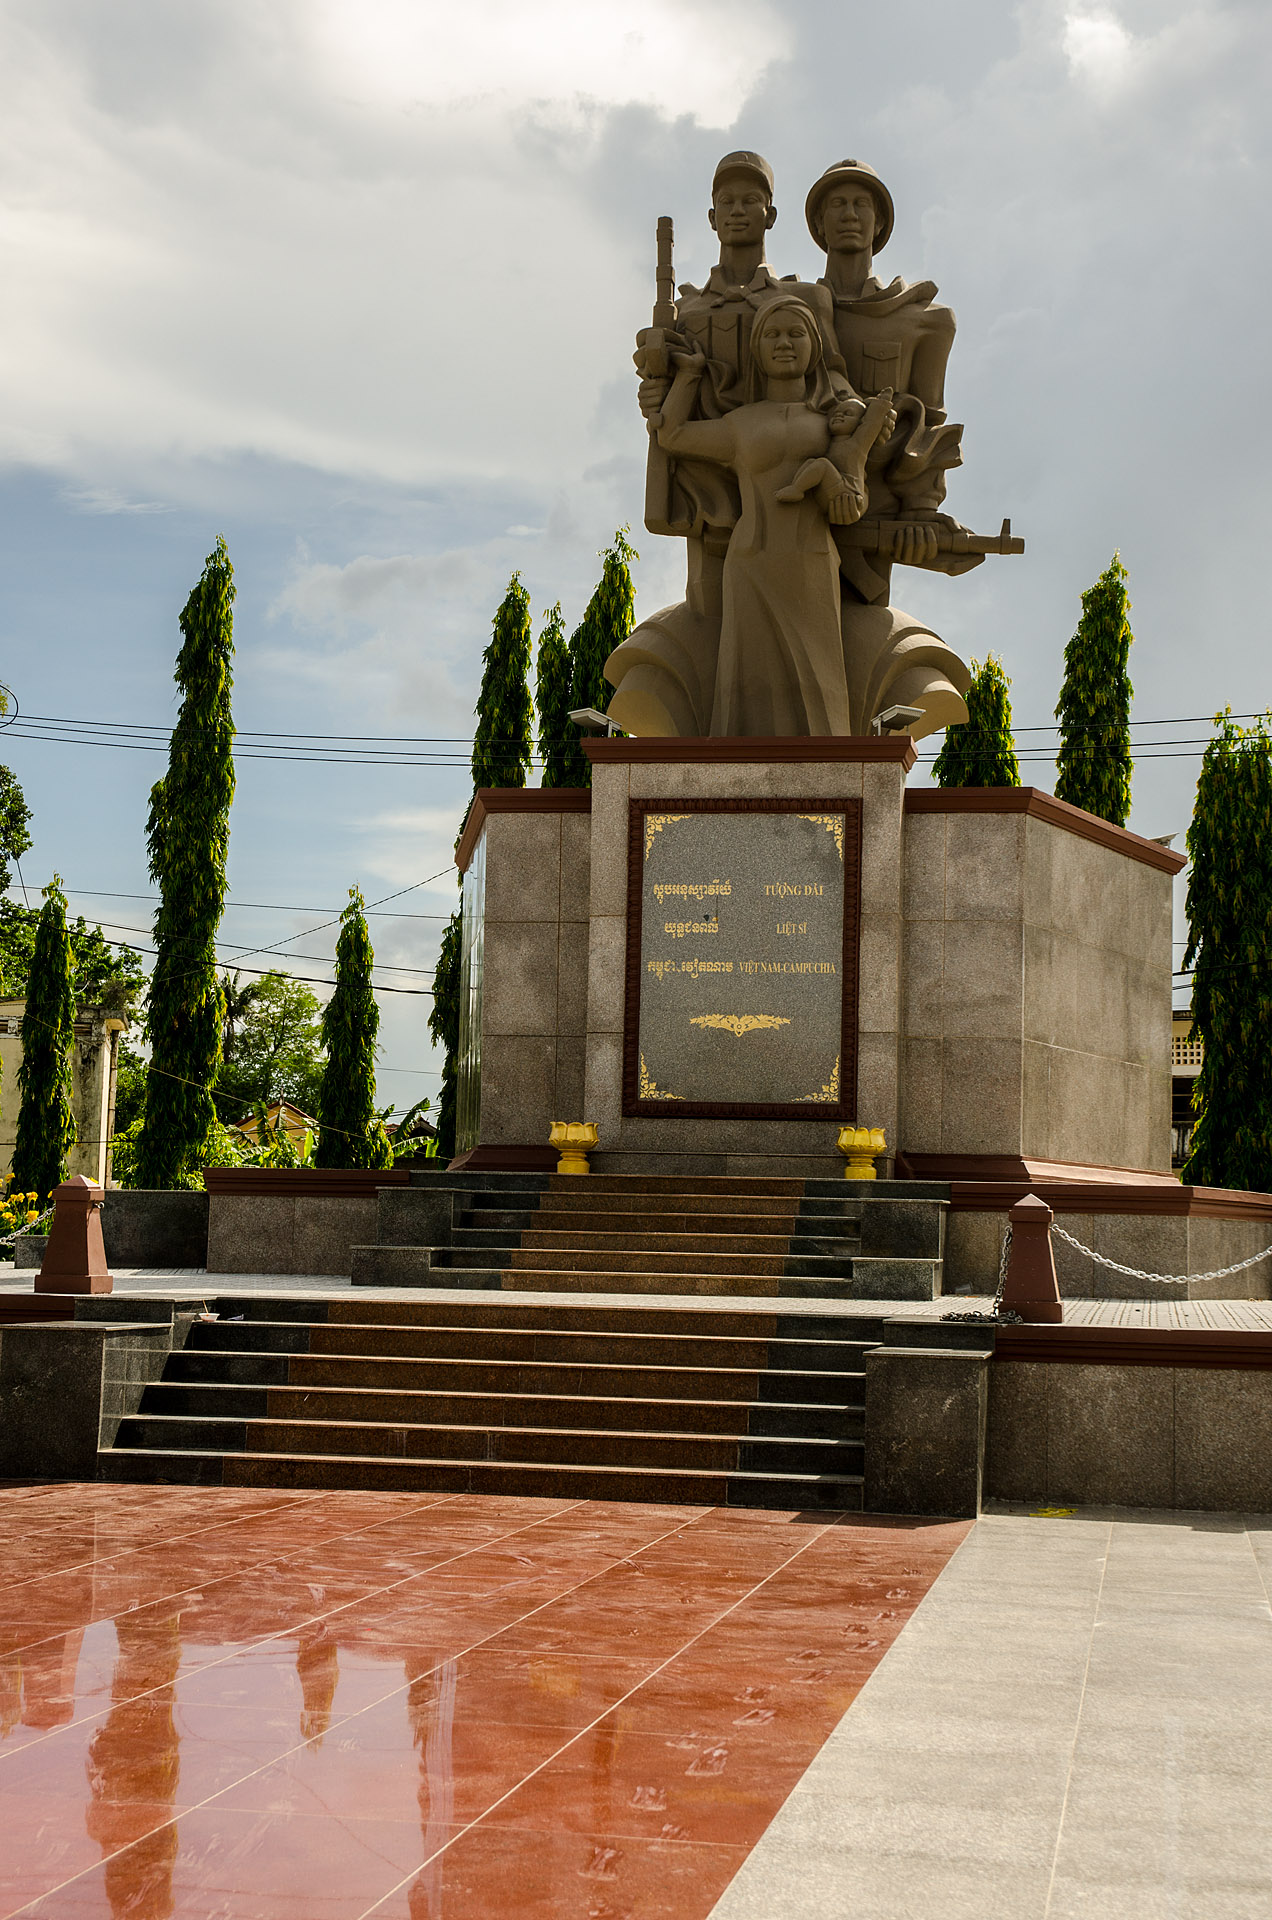 Cambodia-Vietnam Friendship Statue